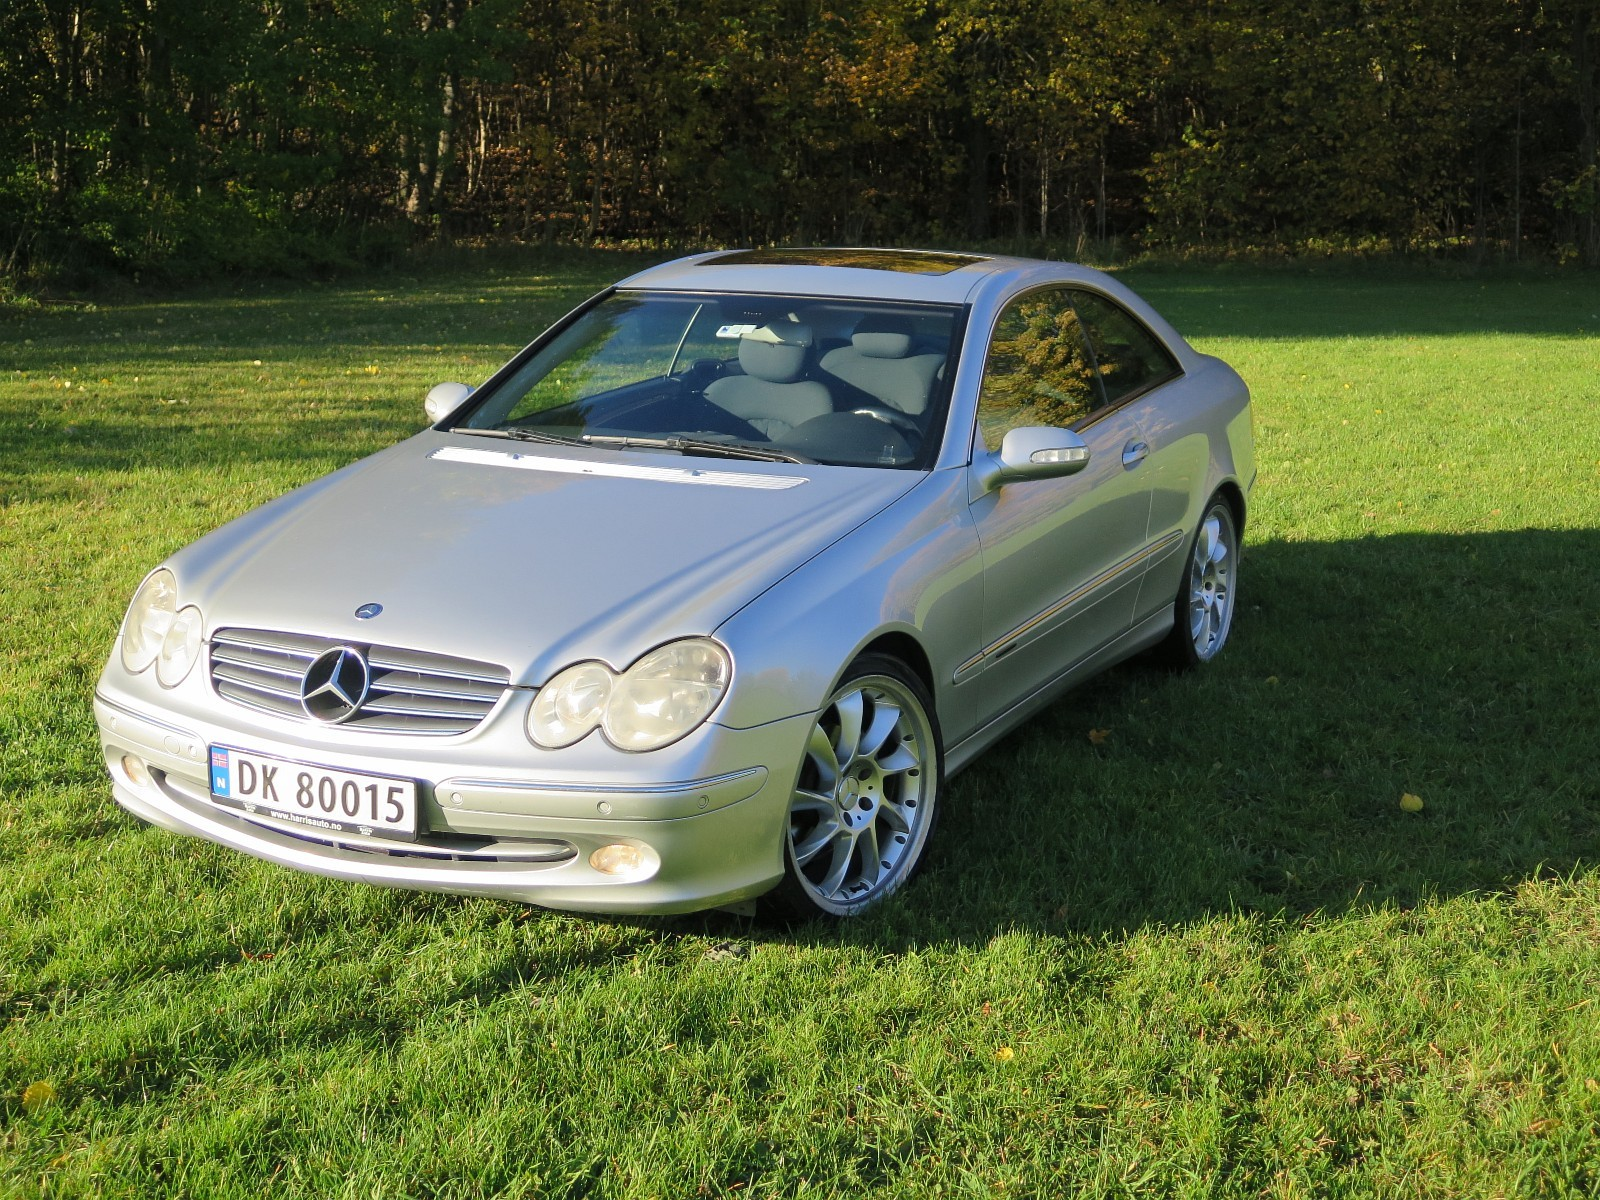 Prosjekt: 2002 Mercedes-Benz CLK 200 Kompressor